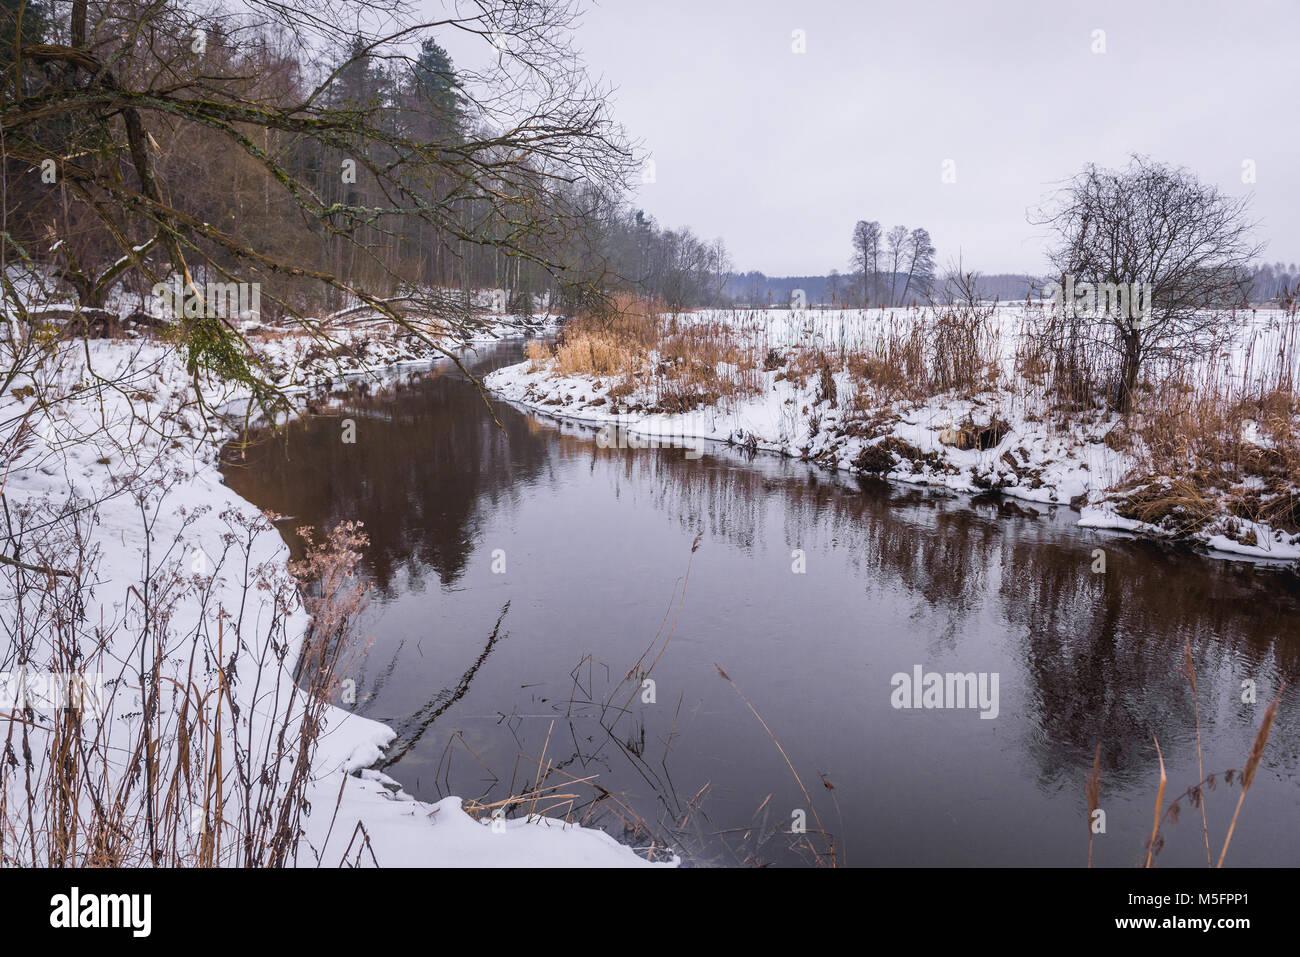 Narewka river, tributary of the Narew river in Gruszki village within Hajnowka County, Podlaskie Voivodeship of - Stock Image